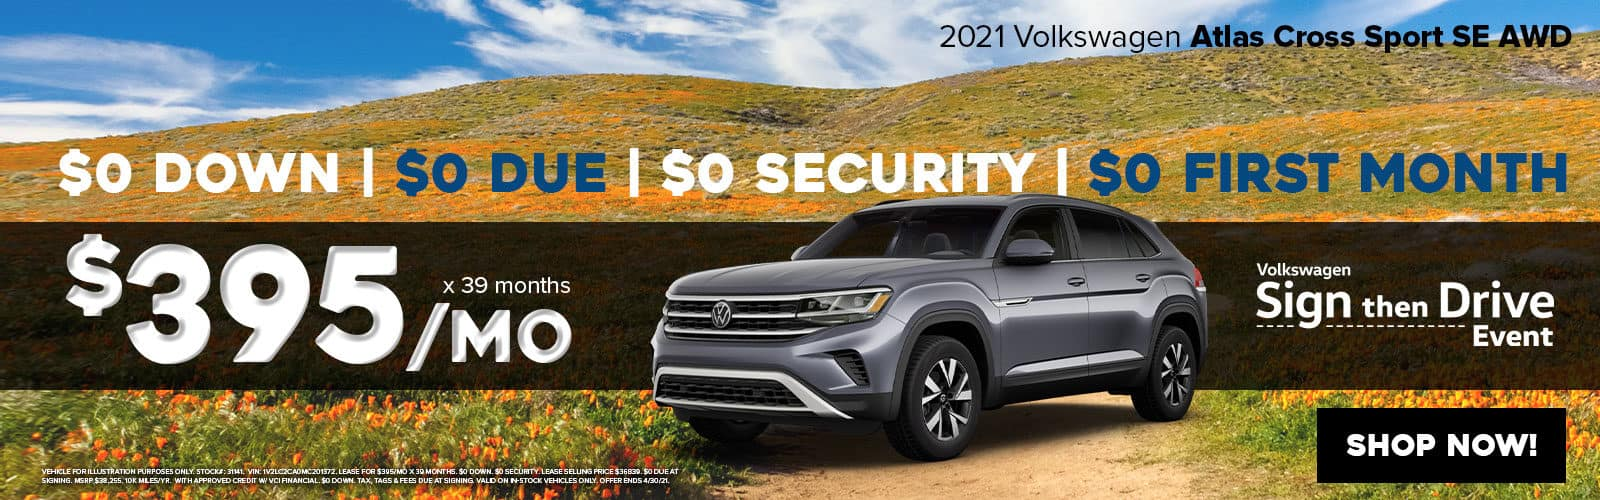 4_21_Wyoming_Valley_VW_Web_Banners_V2-2021-Atlas-Cross-Sport